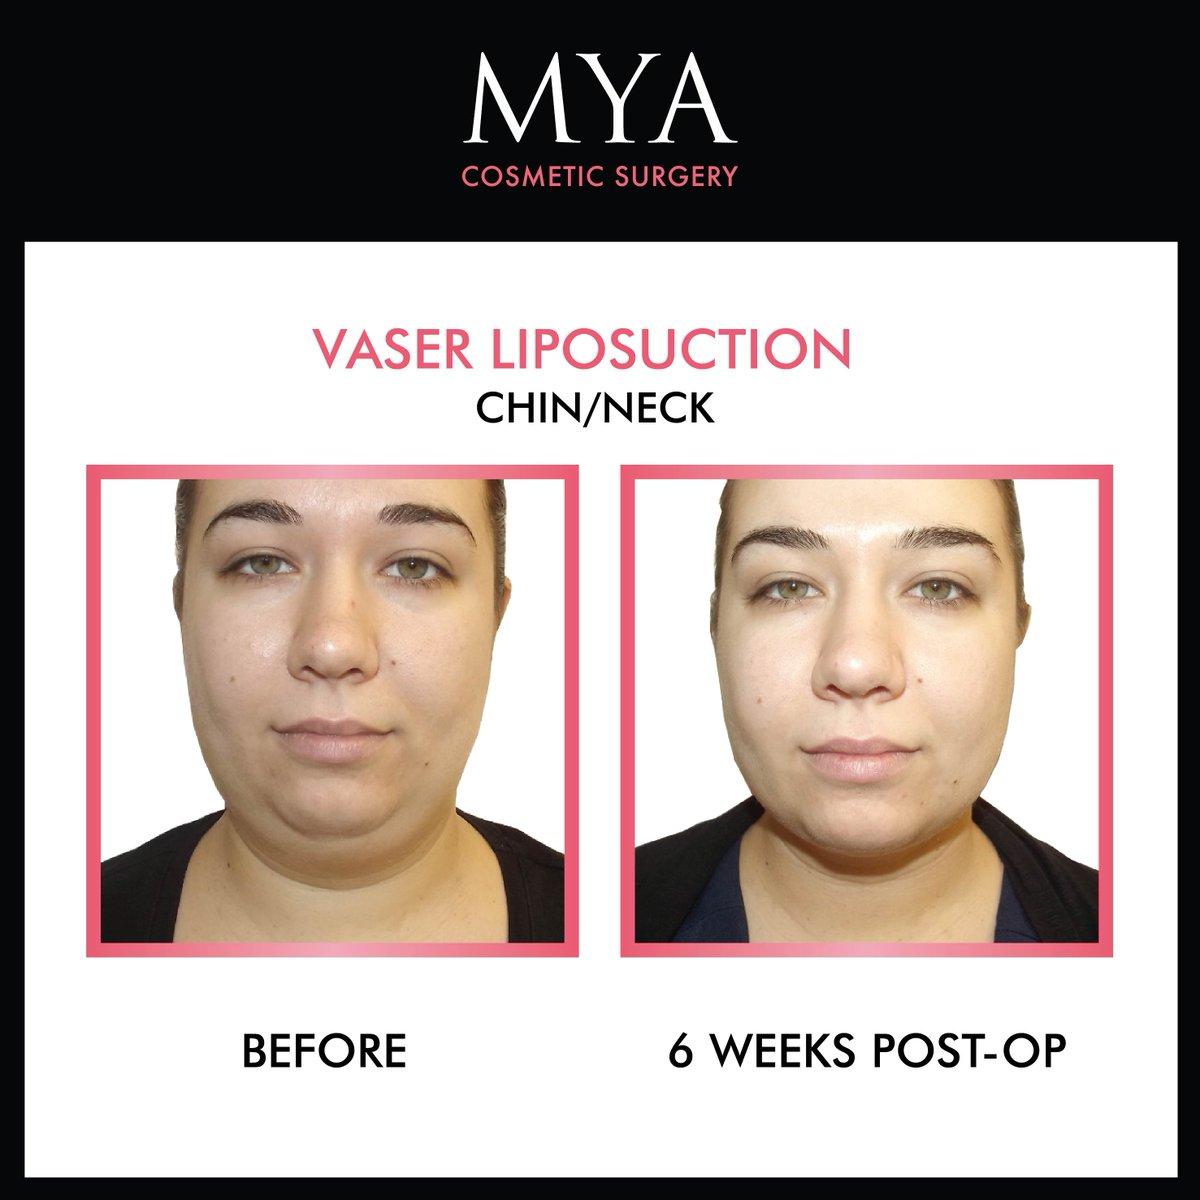 MYA Cosmetic Surgery on Twitter: